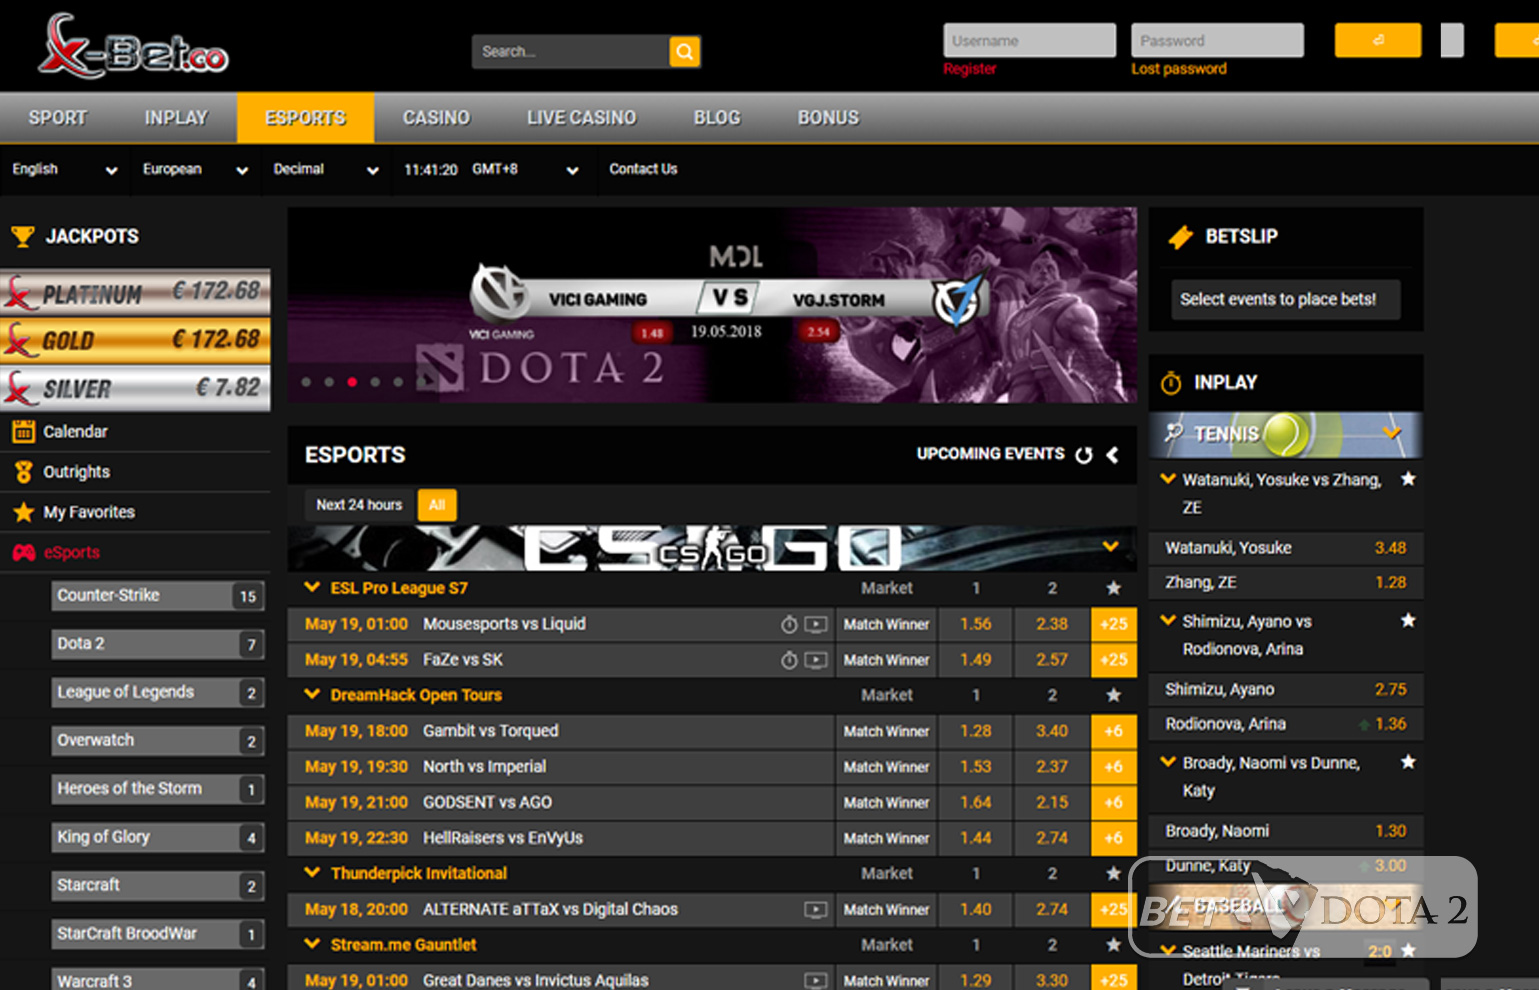 Dota 2 betting facebook layouts betting express.com